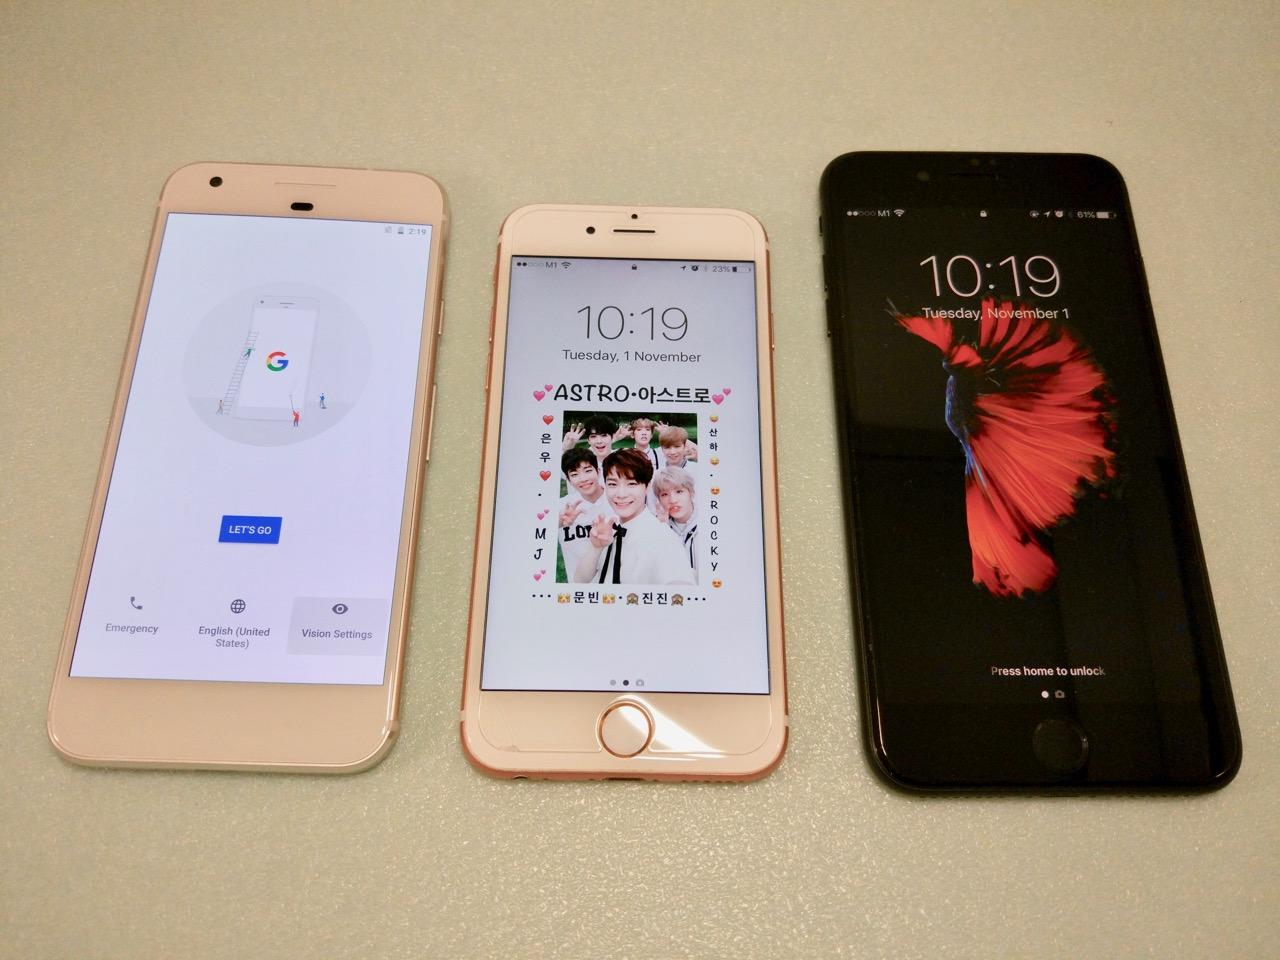 google-pixel-review-compare-pixel-vs-iphone-7-vs-iphone-7-plus